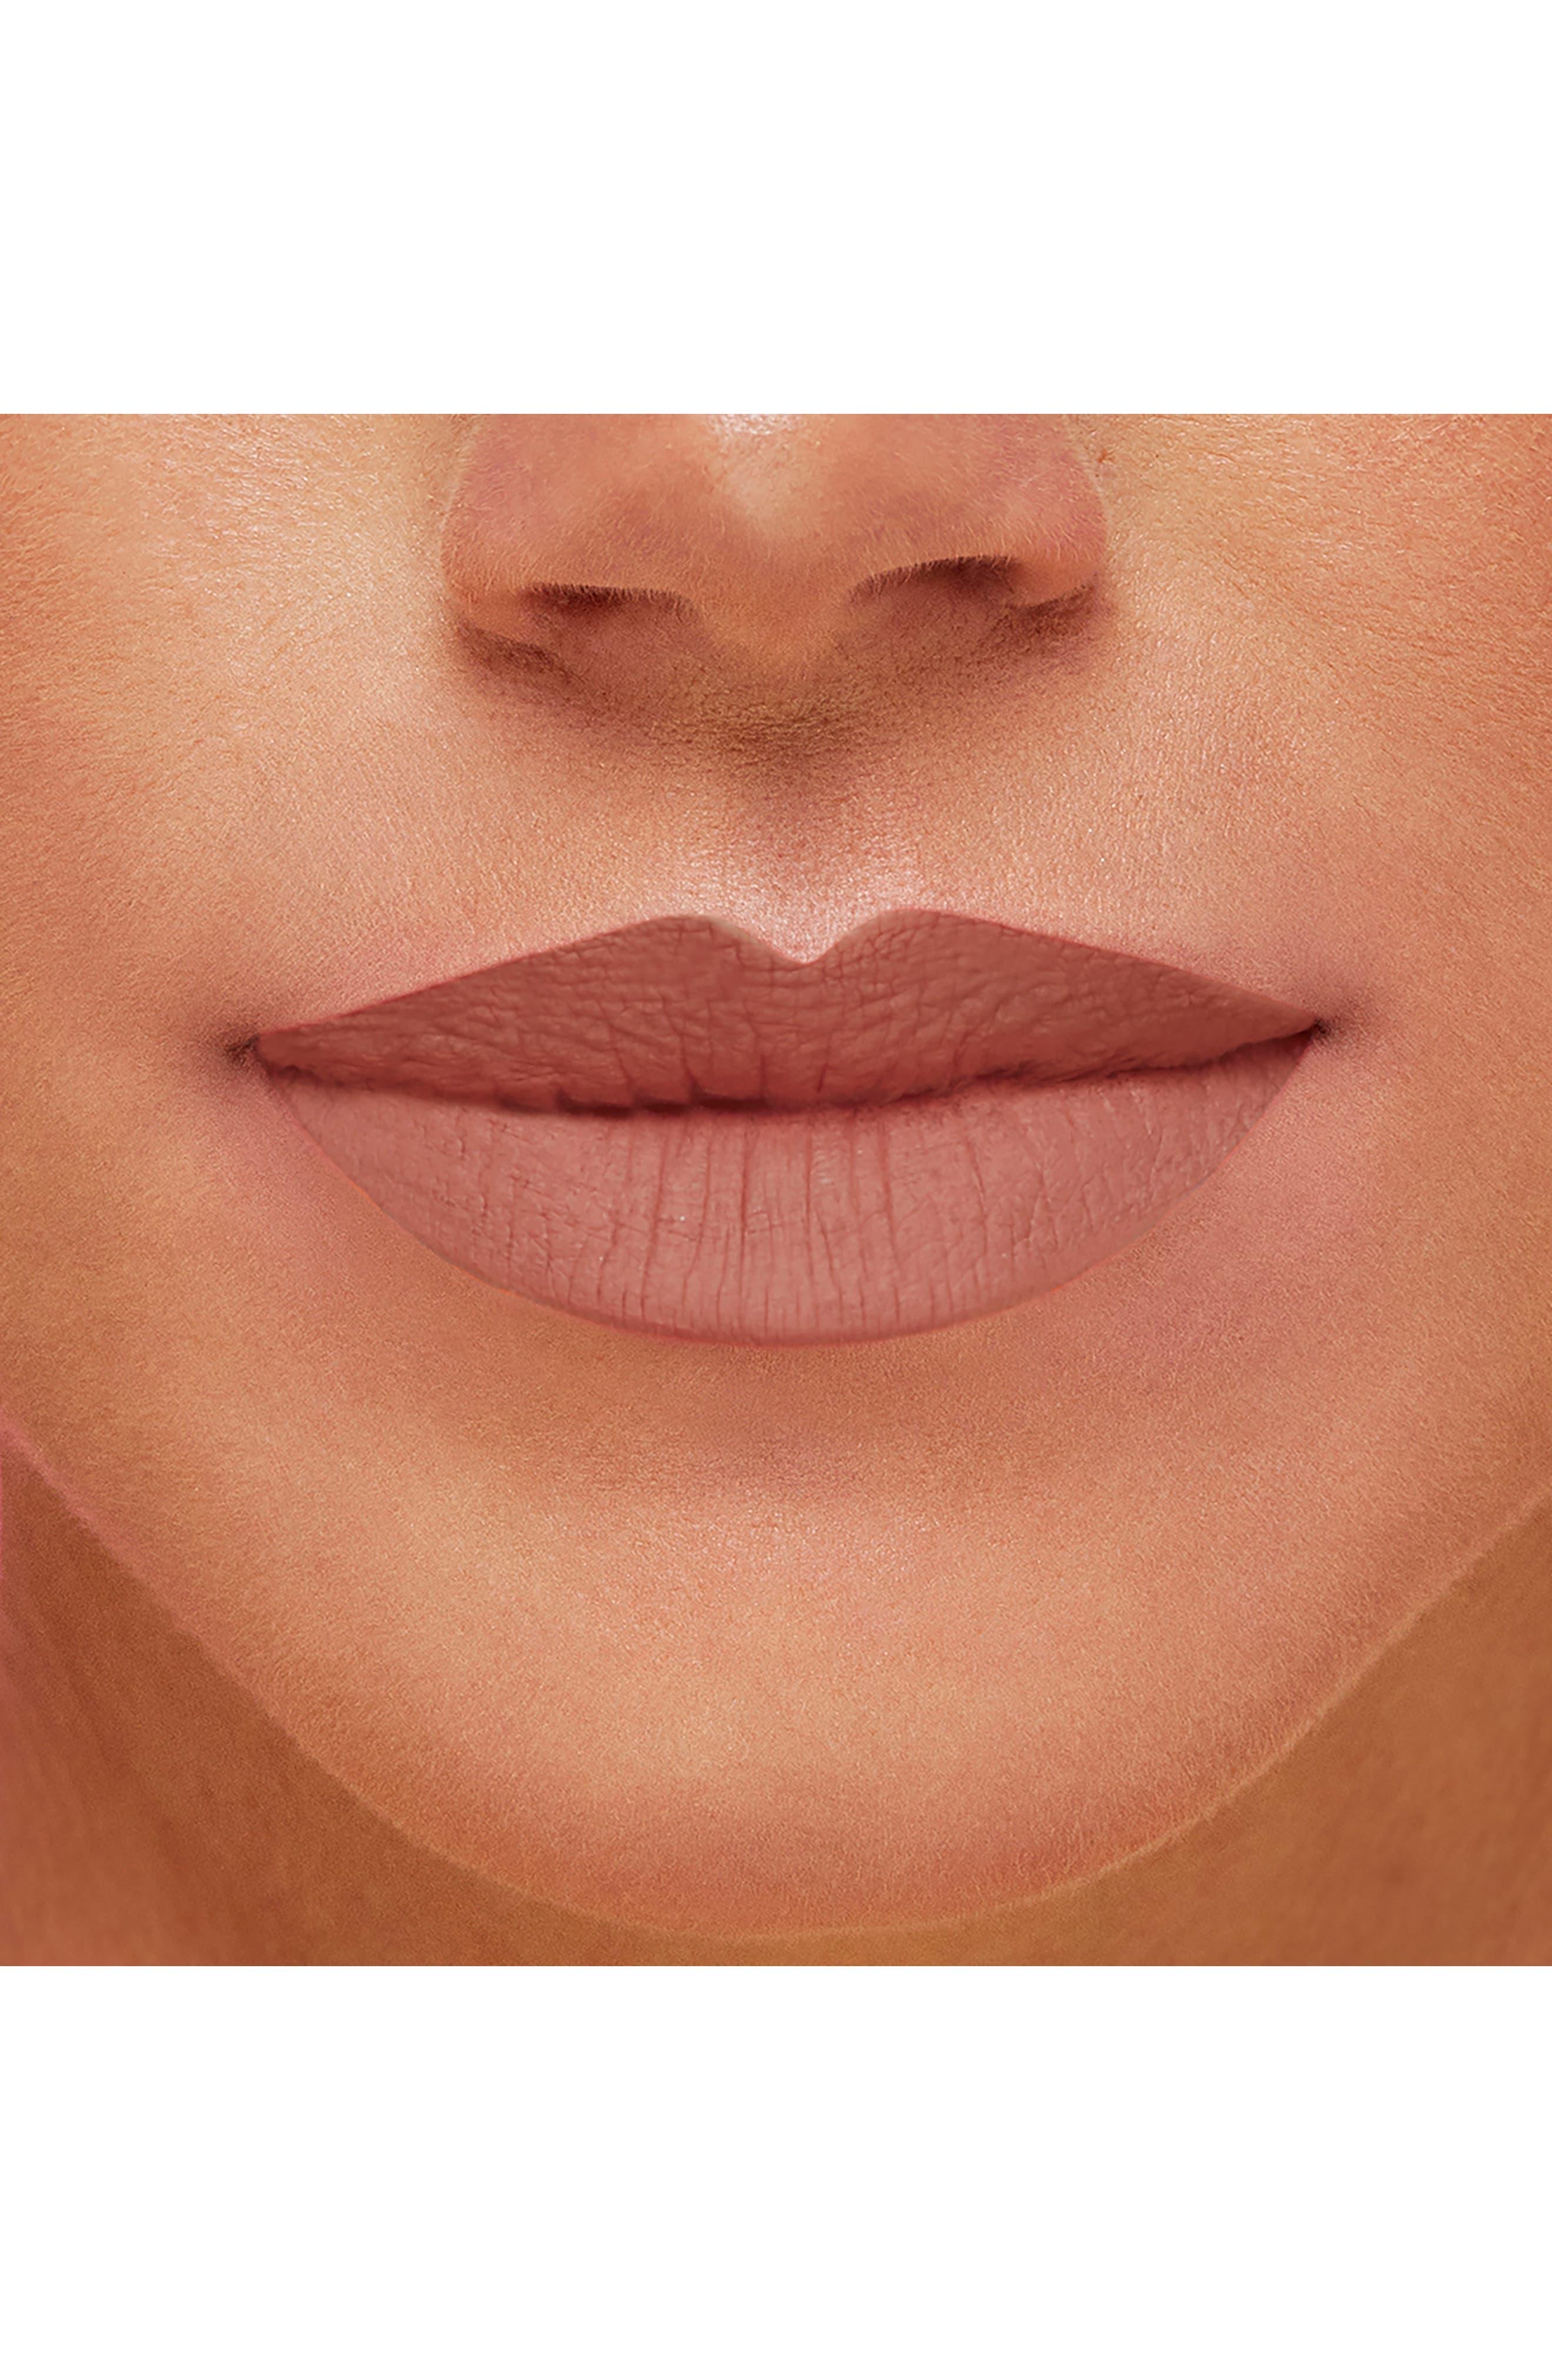 KARL LAGERFELD + MODELCO Kiss Me Karl Lip Lights Lipstick,                             Alternate thumbnail 6, color,                             200